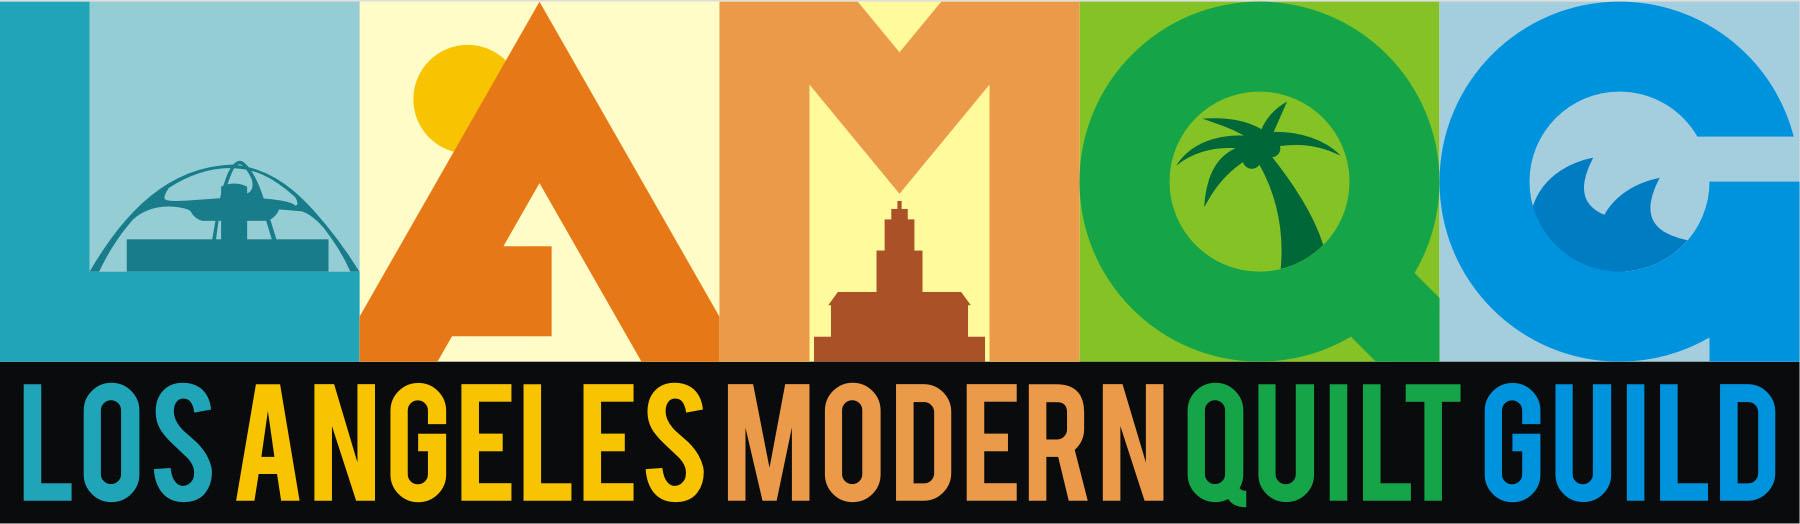 Los Angeles Modern Quilt Guild